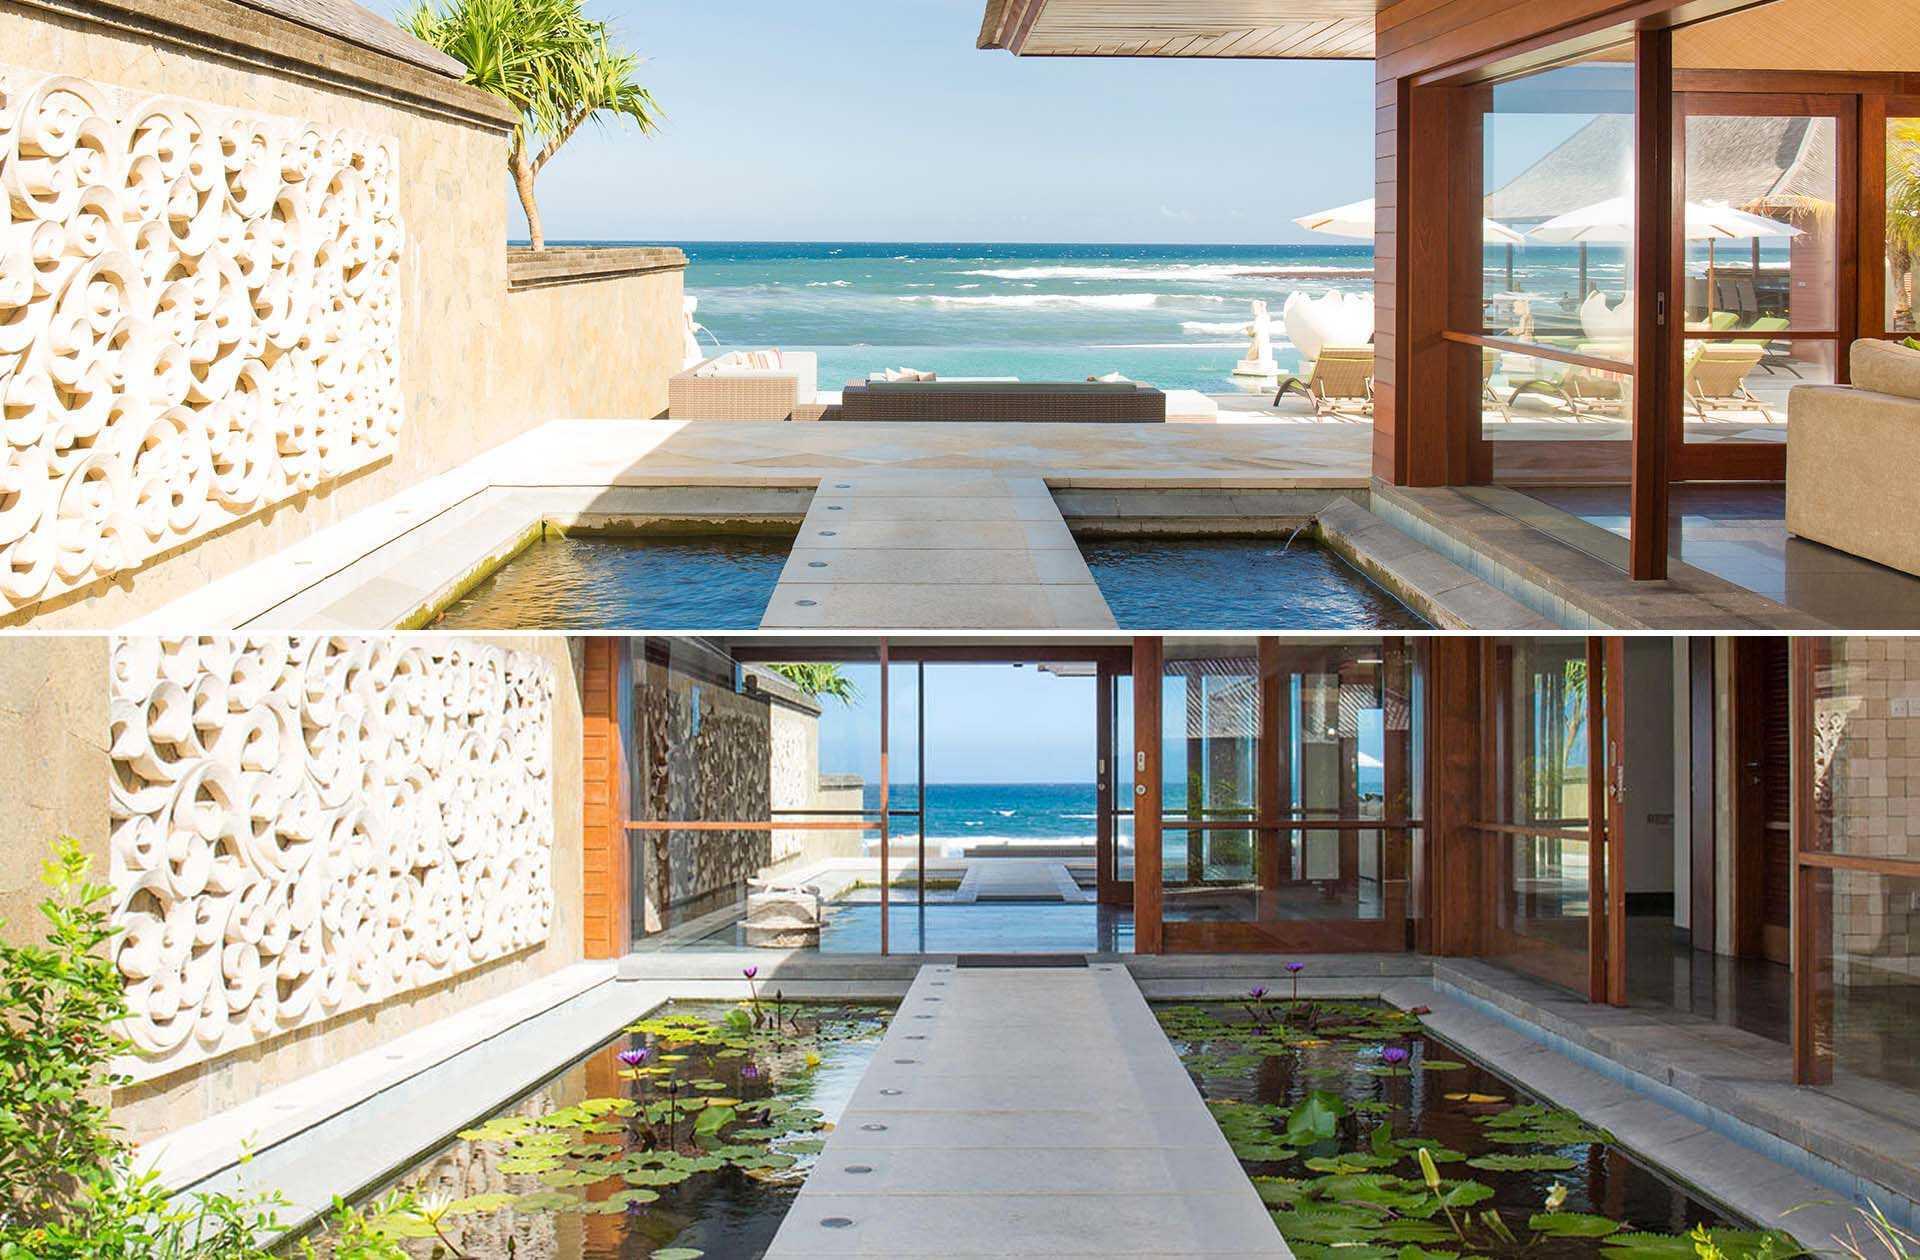 Agung Budi Raharsa | Architecture & Engineering Bayu Gita Villa - Bali Bali, Indonesia Bali, Indonesia Agung-Budi-Raharsa-Bayu-Gita-Villa-By-Agung-Budi-Raharsa-With-Csa  88351